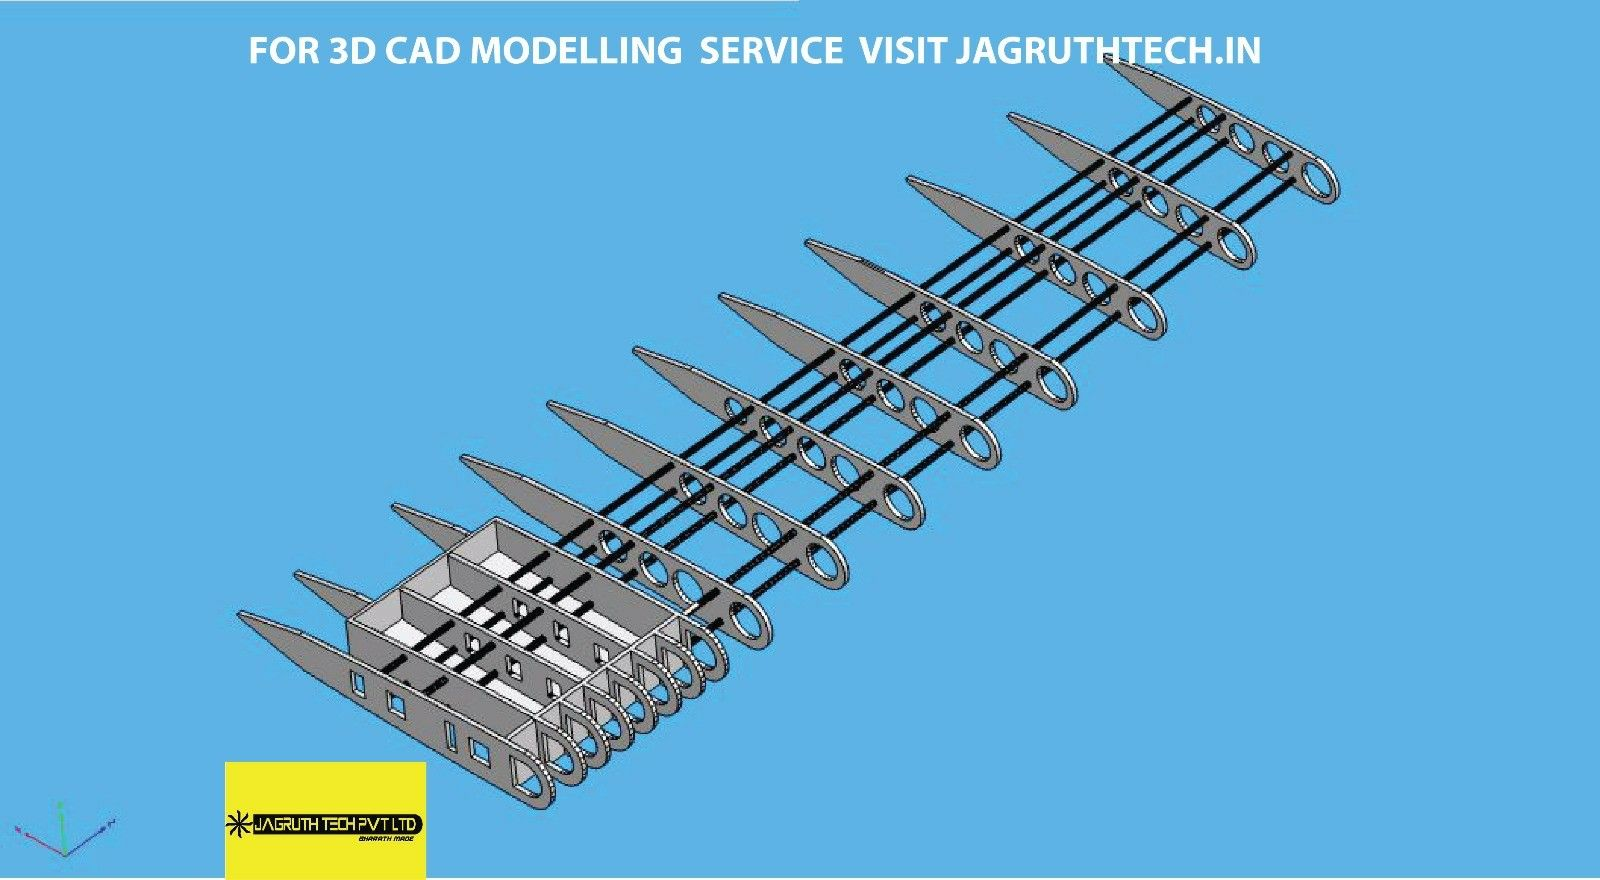 3D CAD model of aircraft wing by Jagruthtech in Jagruth Tech Pvt Ltd